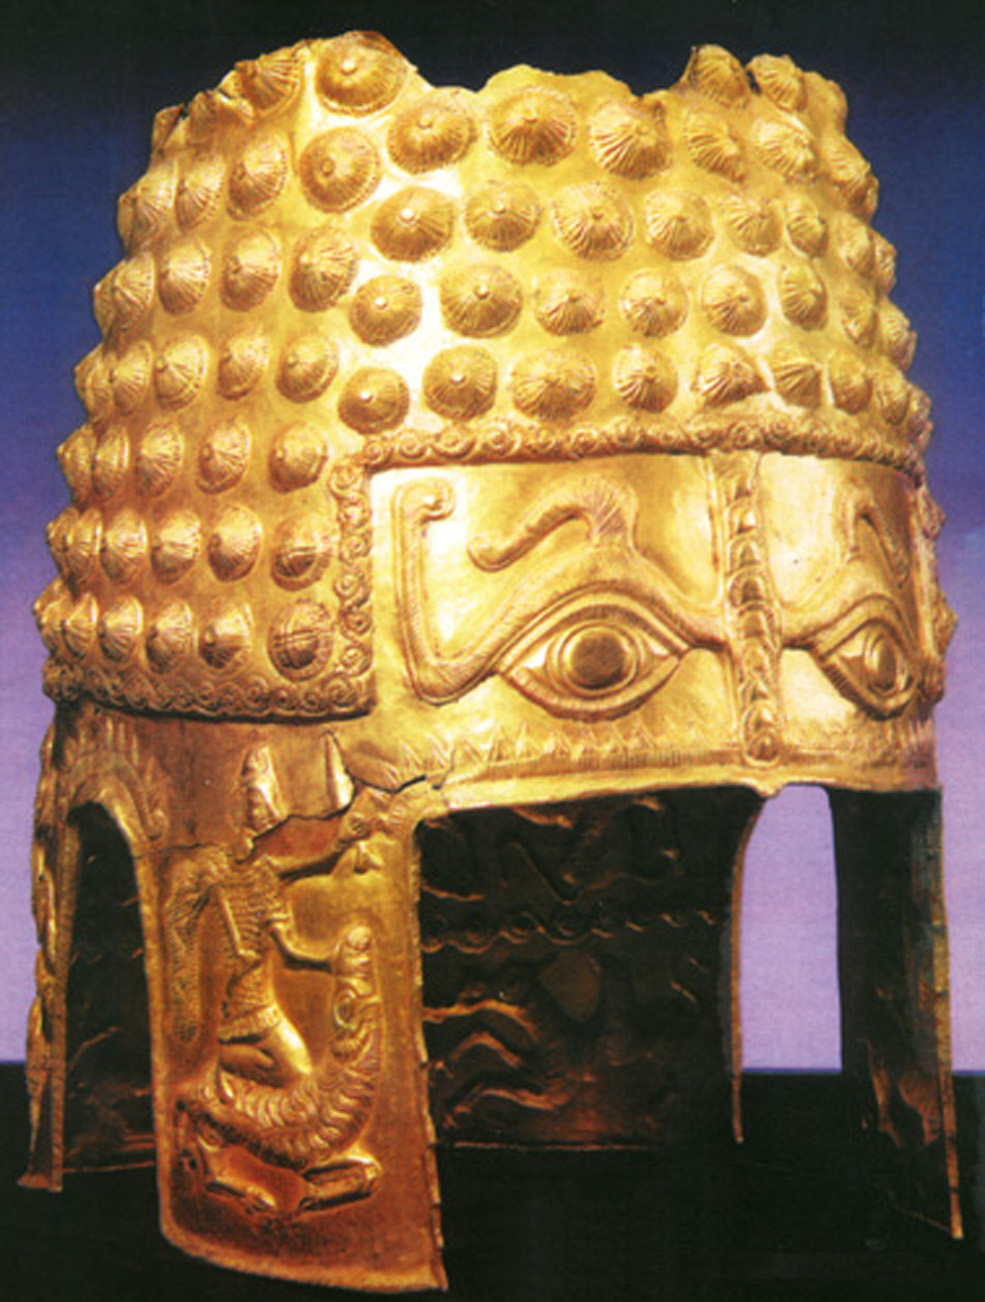 Coiful de aur descoperit la Cotofenesti